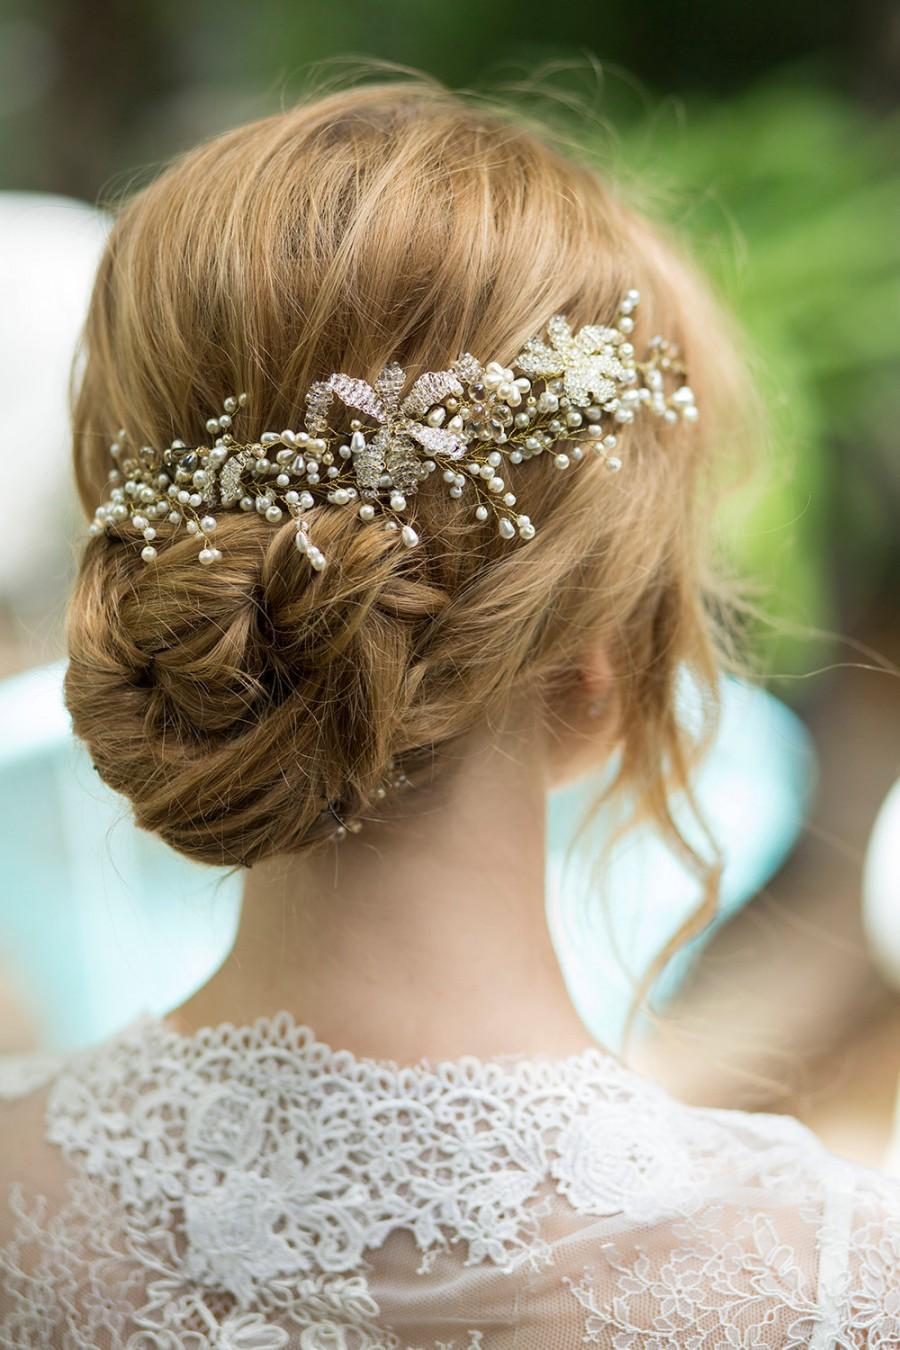 Hochzeit - SALE! Bridal headpiece, pearls hair piece, beaded wedding hairpiece, pearl hair jewelry. The Fuchsia headpiece.